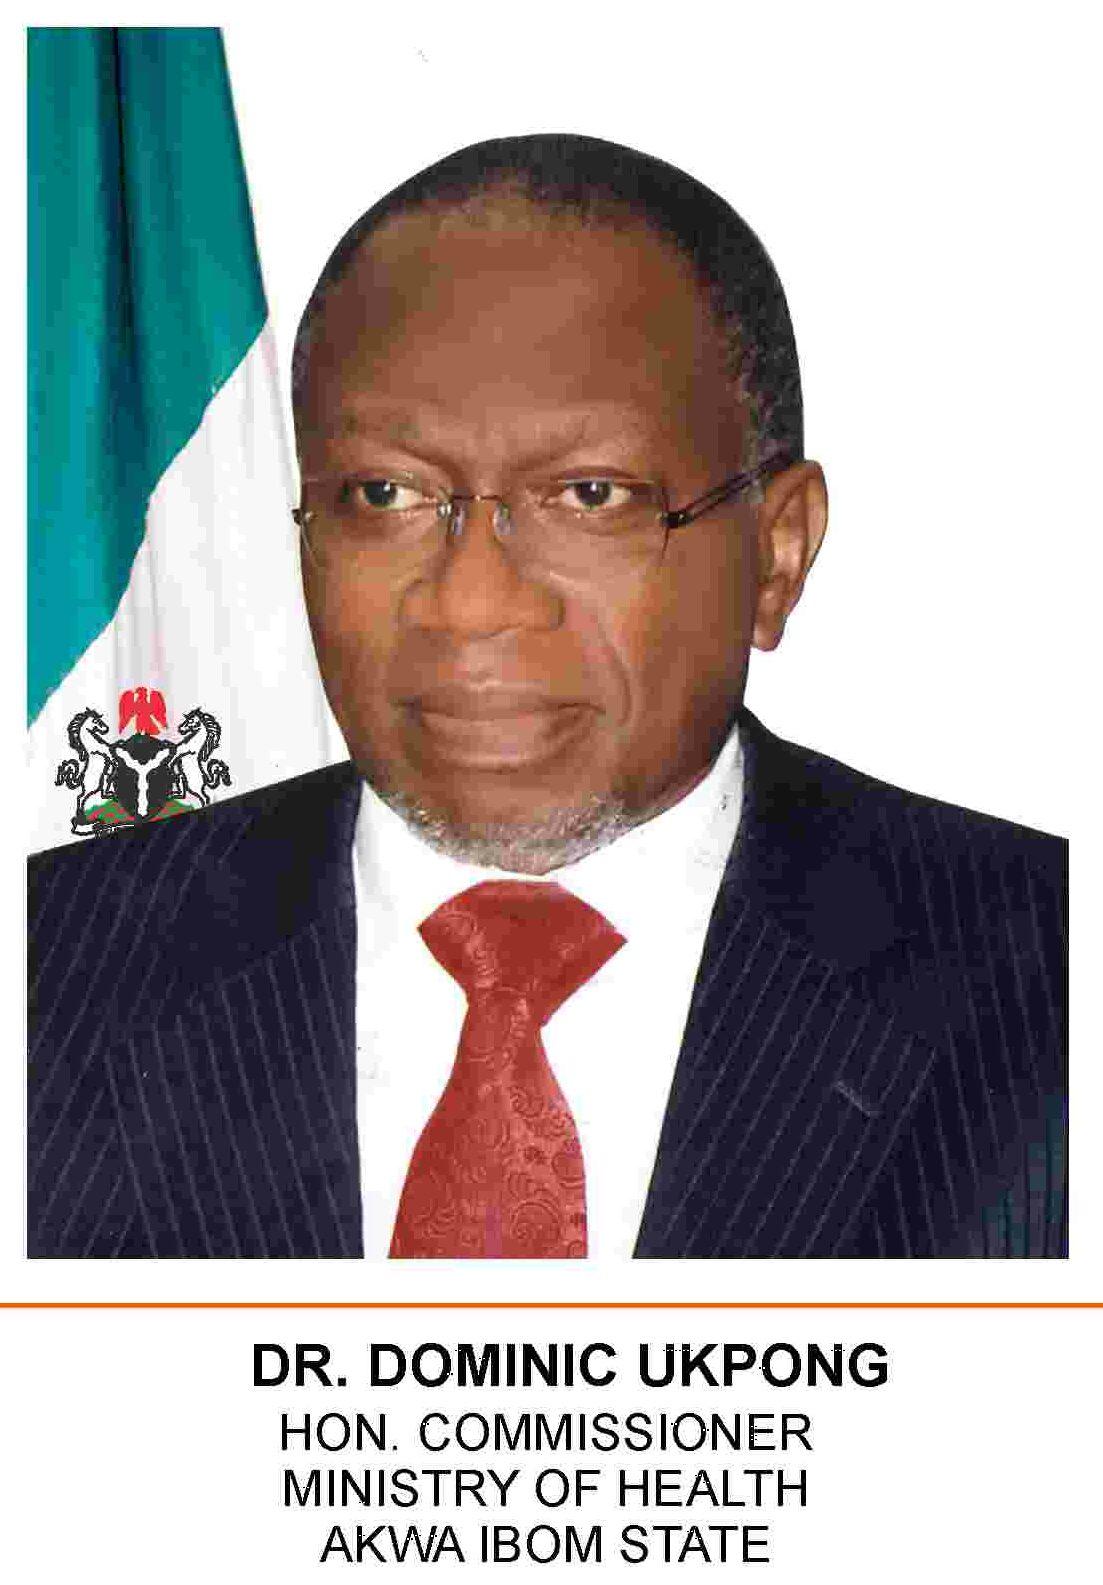 COVID-19: Healthcare professionals call for A-Ibom Commissioner's resignation - Vanguard